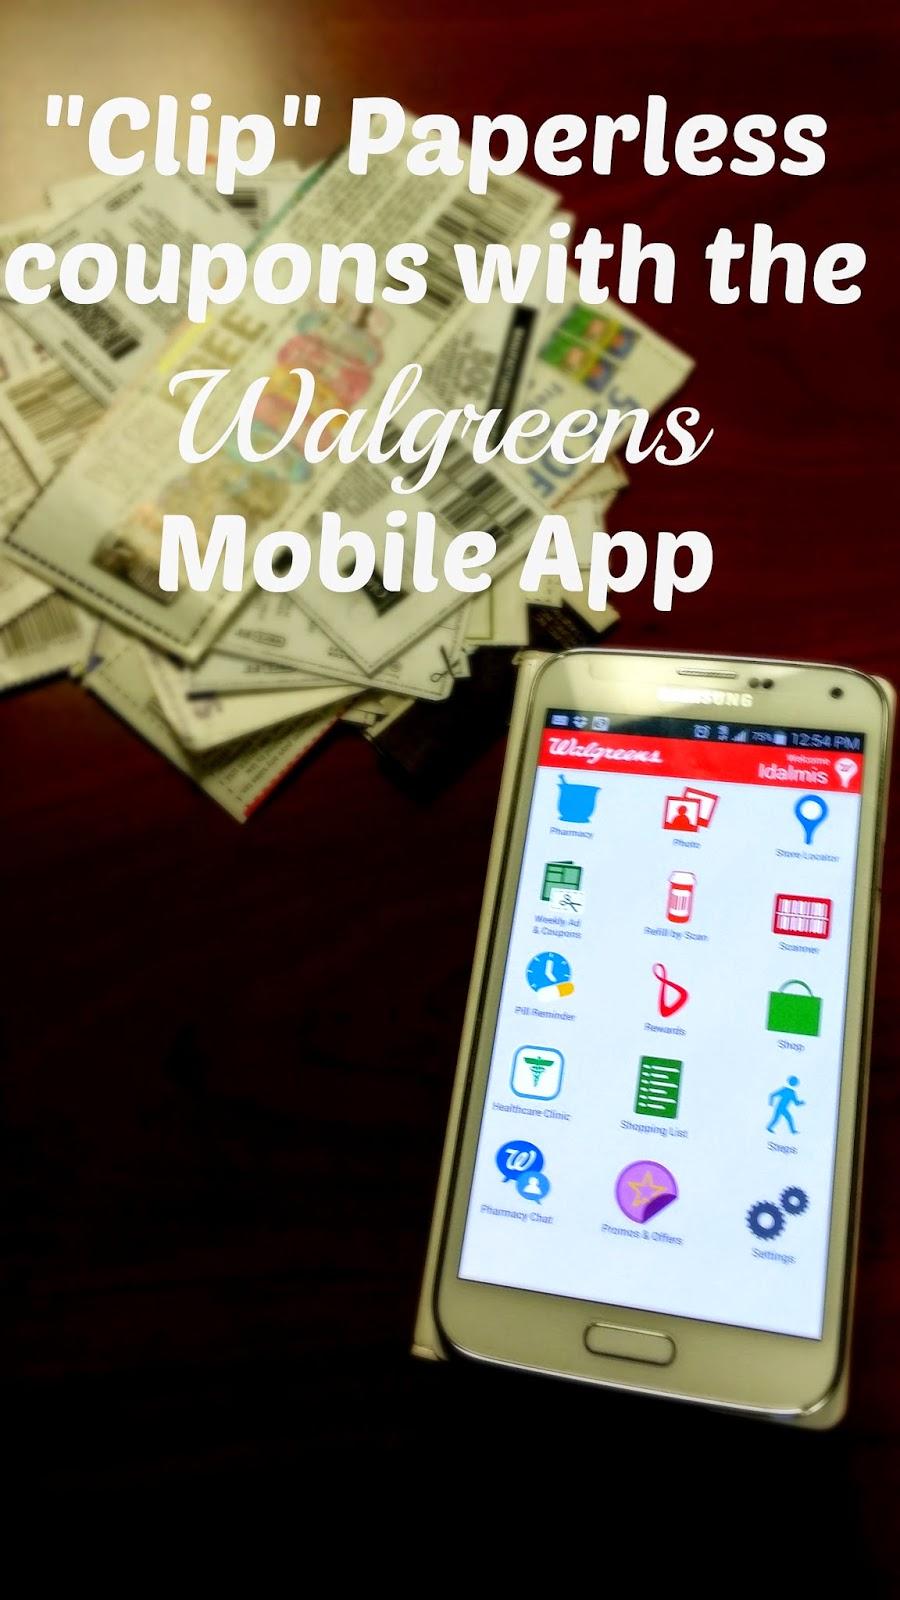 Go Paperless and Save Money at Walgreens #WalgreensPaperless #shop